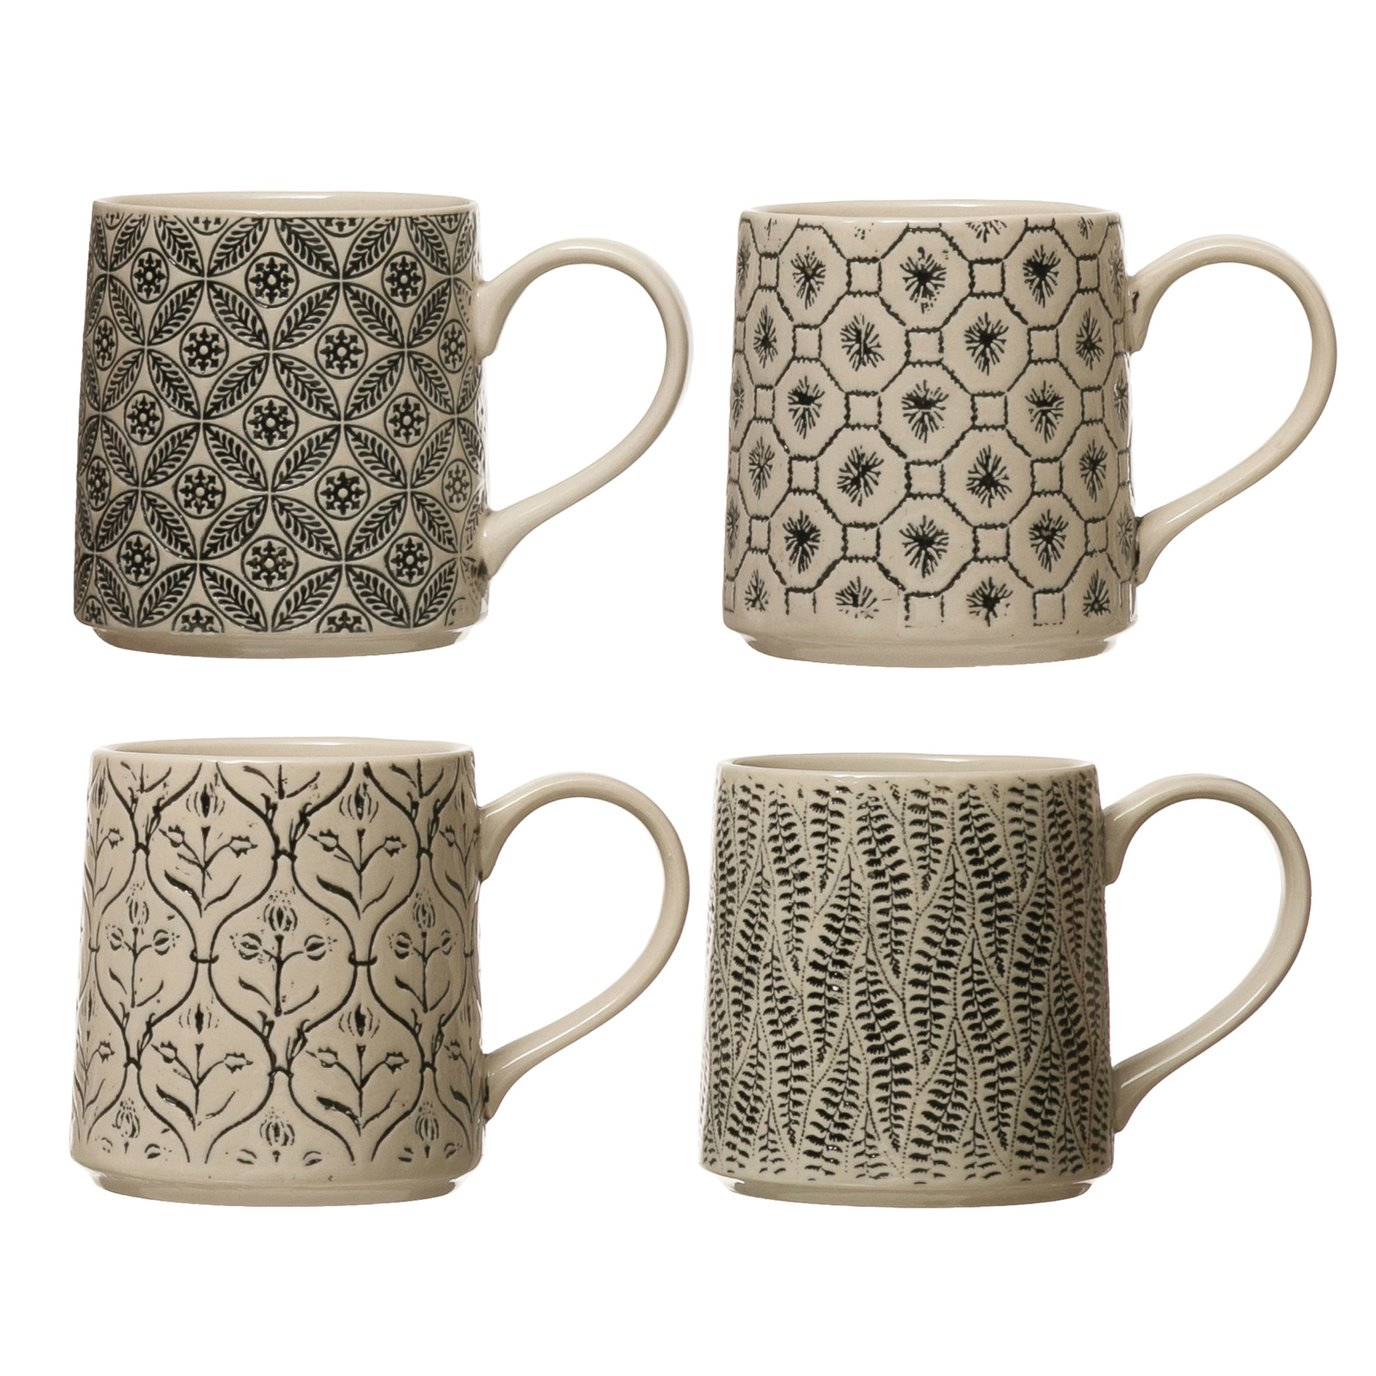 16 oz. Hand-Stamped Stoneware Mug w/ Embossed Pattern, Black & Cream Color, 4 Styles